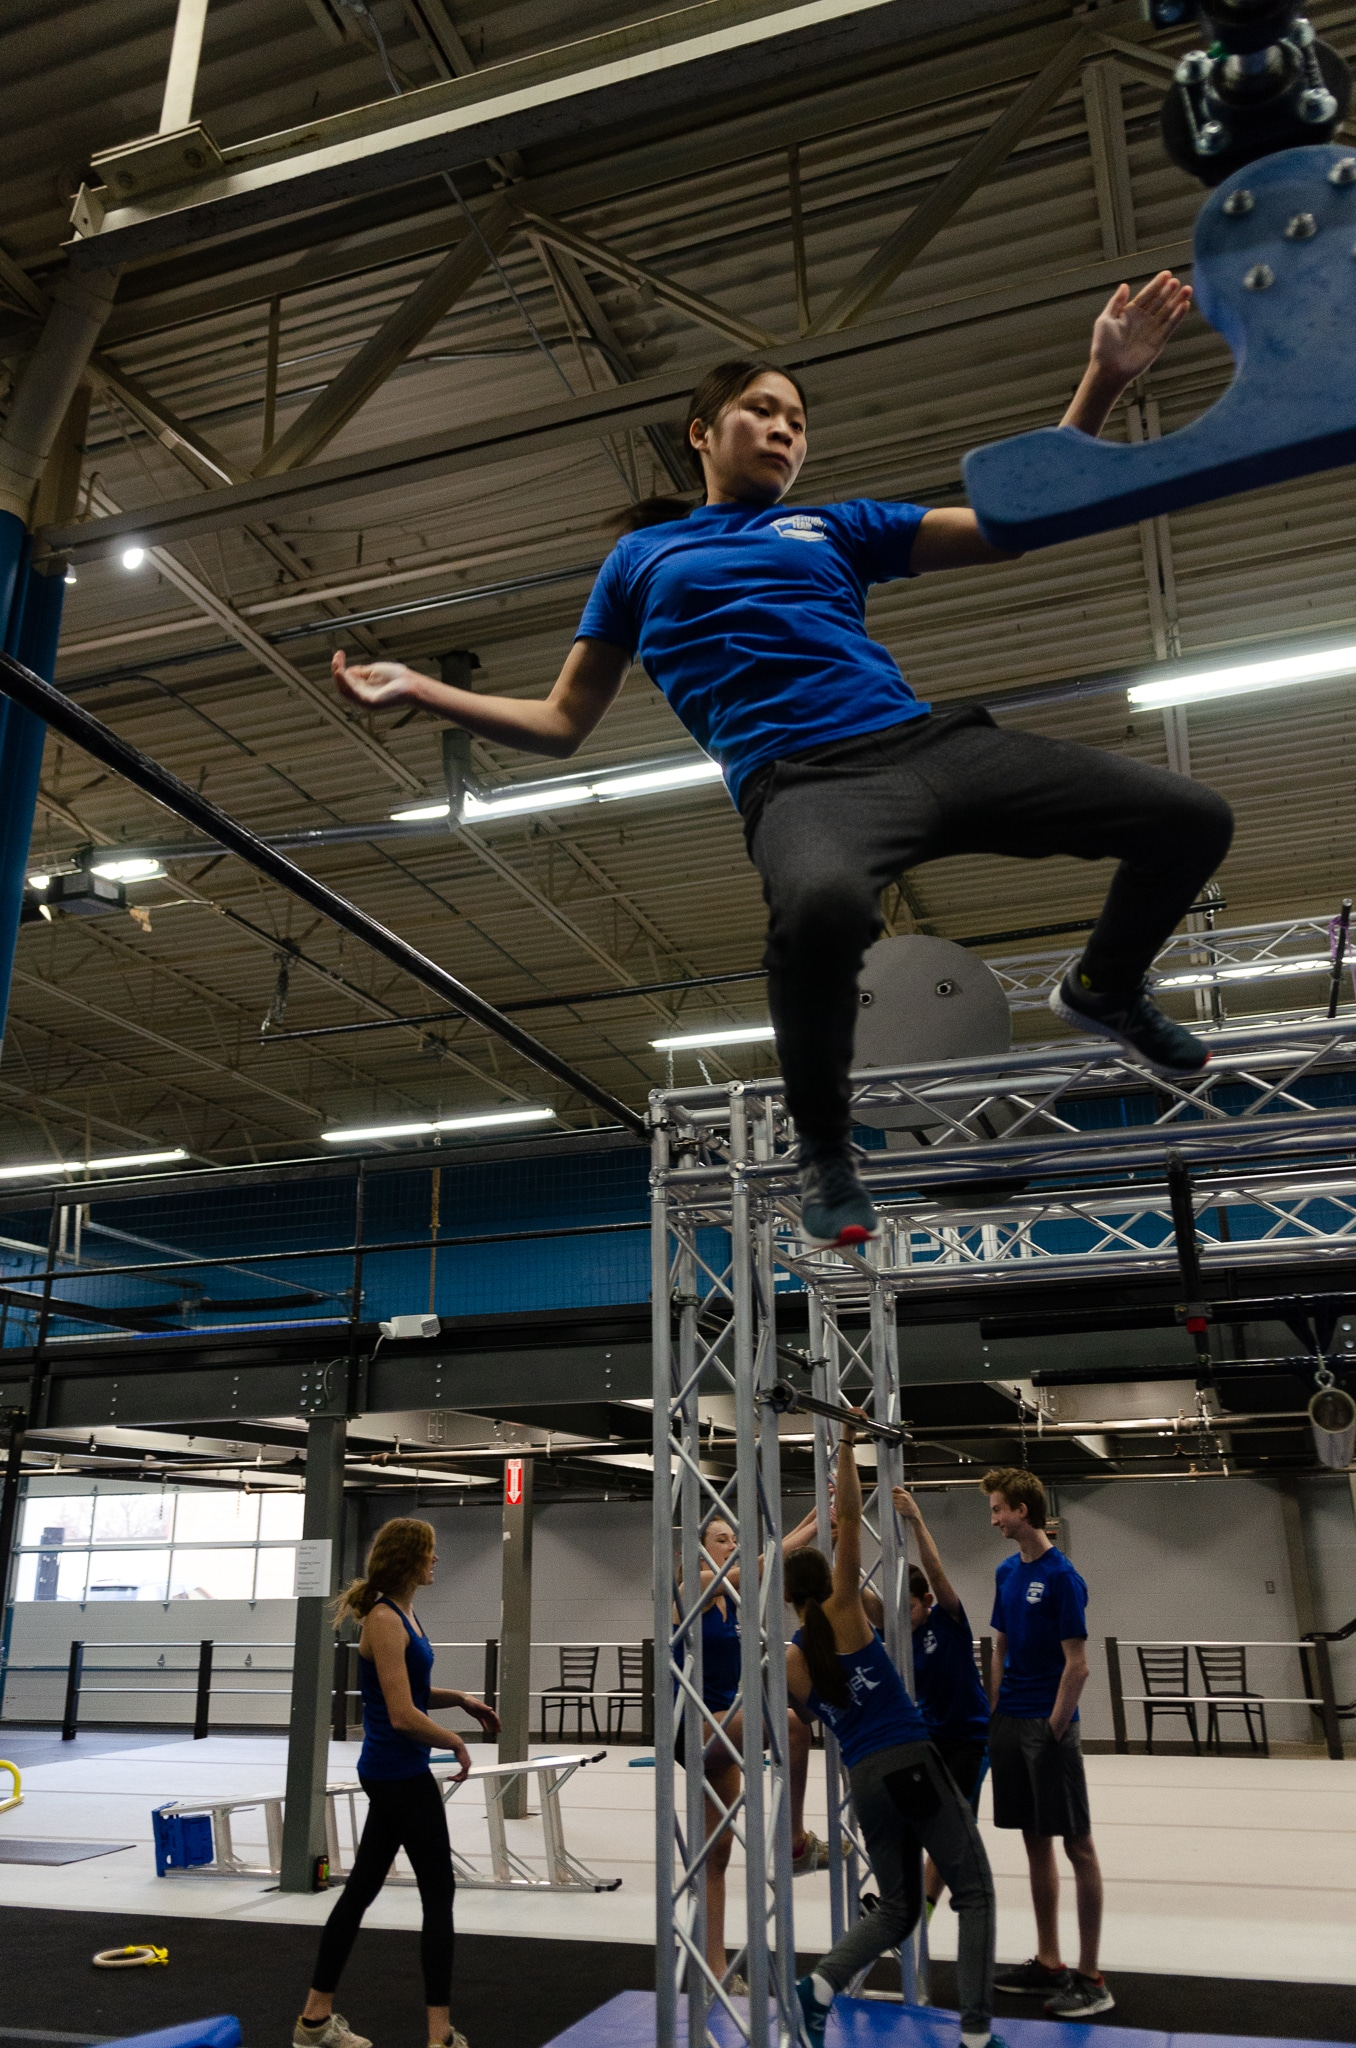 Coach Sophie - Youth Ninja Warrior Trainer/Coach